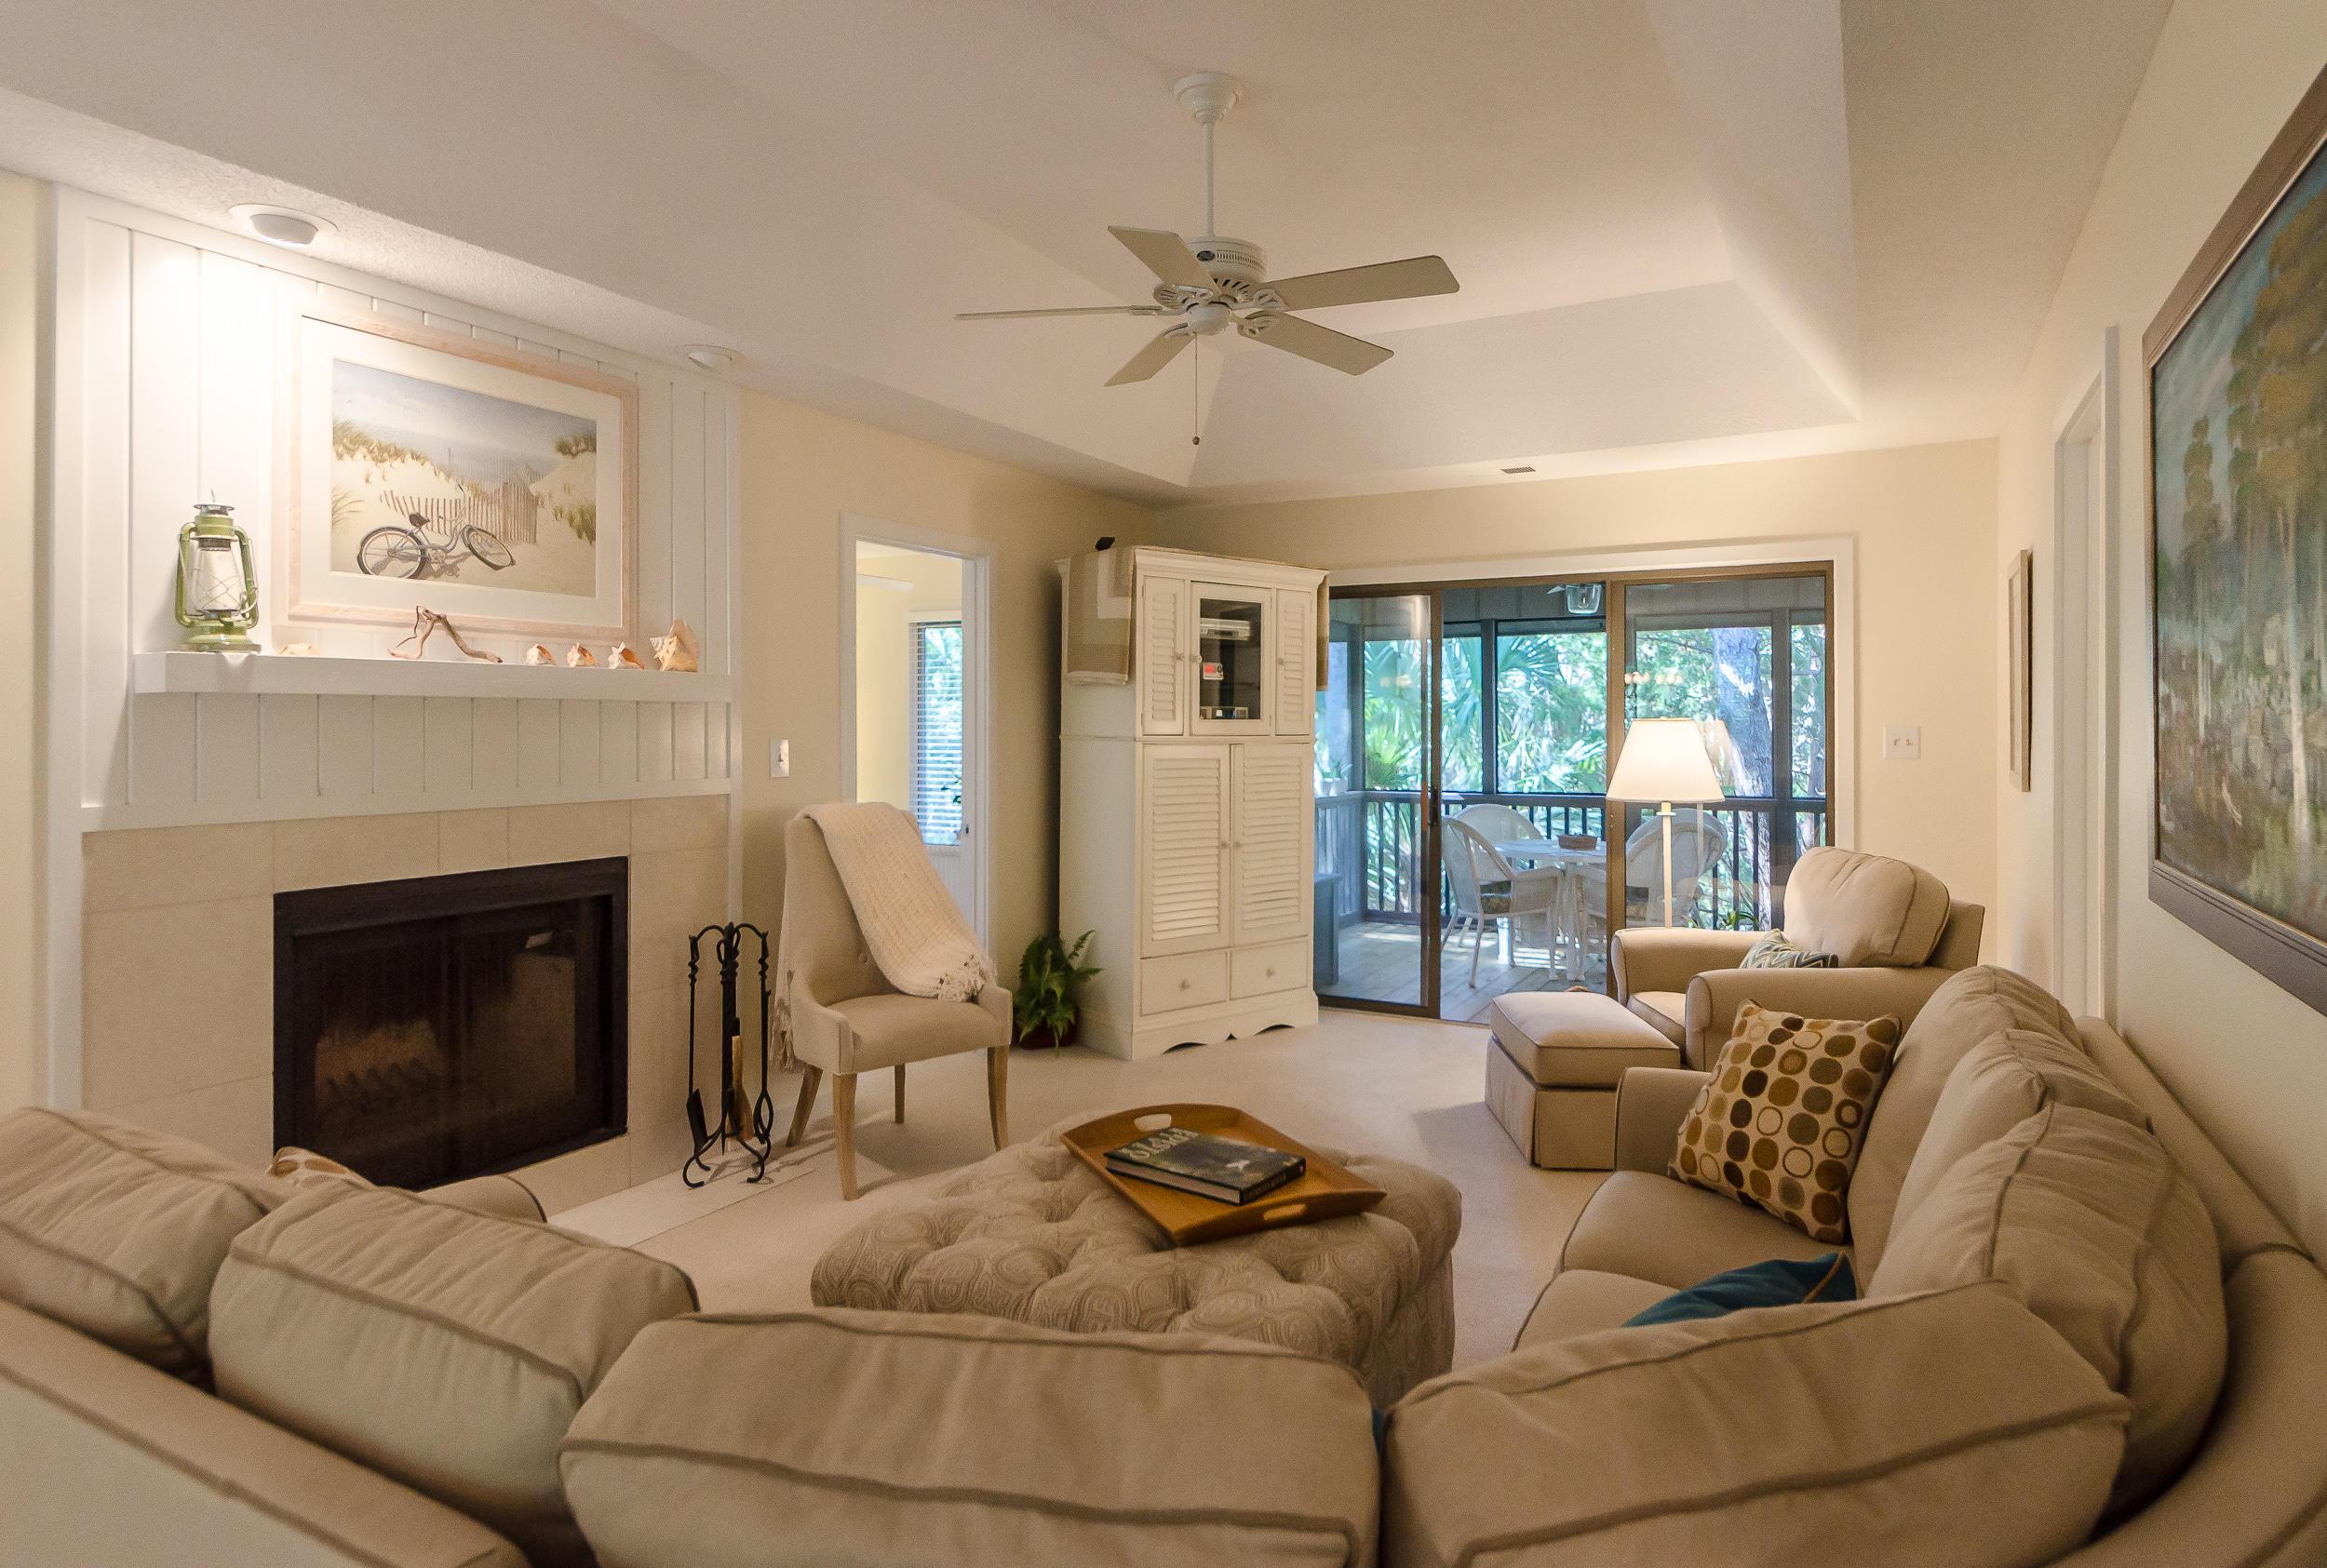 Kiawah Island Homes For Sale - 4186 Bald Pate, Kiawah Island, SC - 9